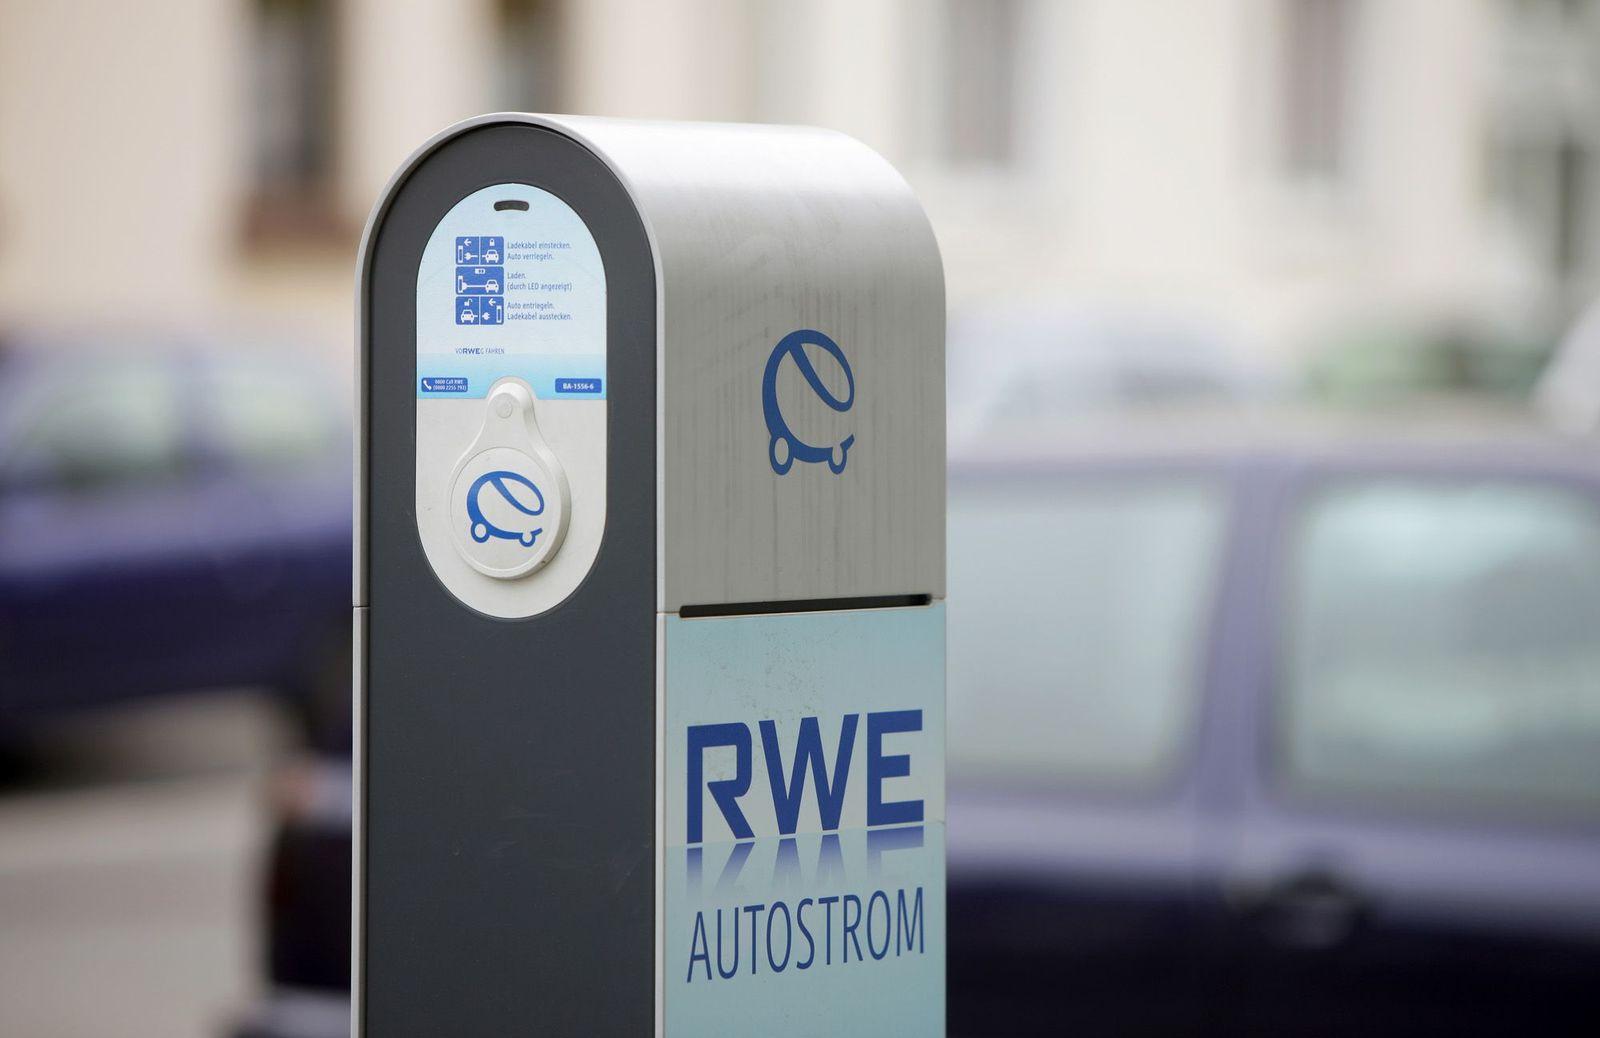 RWE / Ladestation / Auto